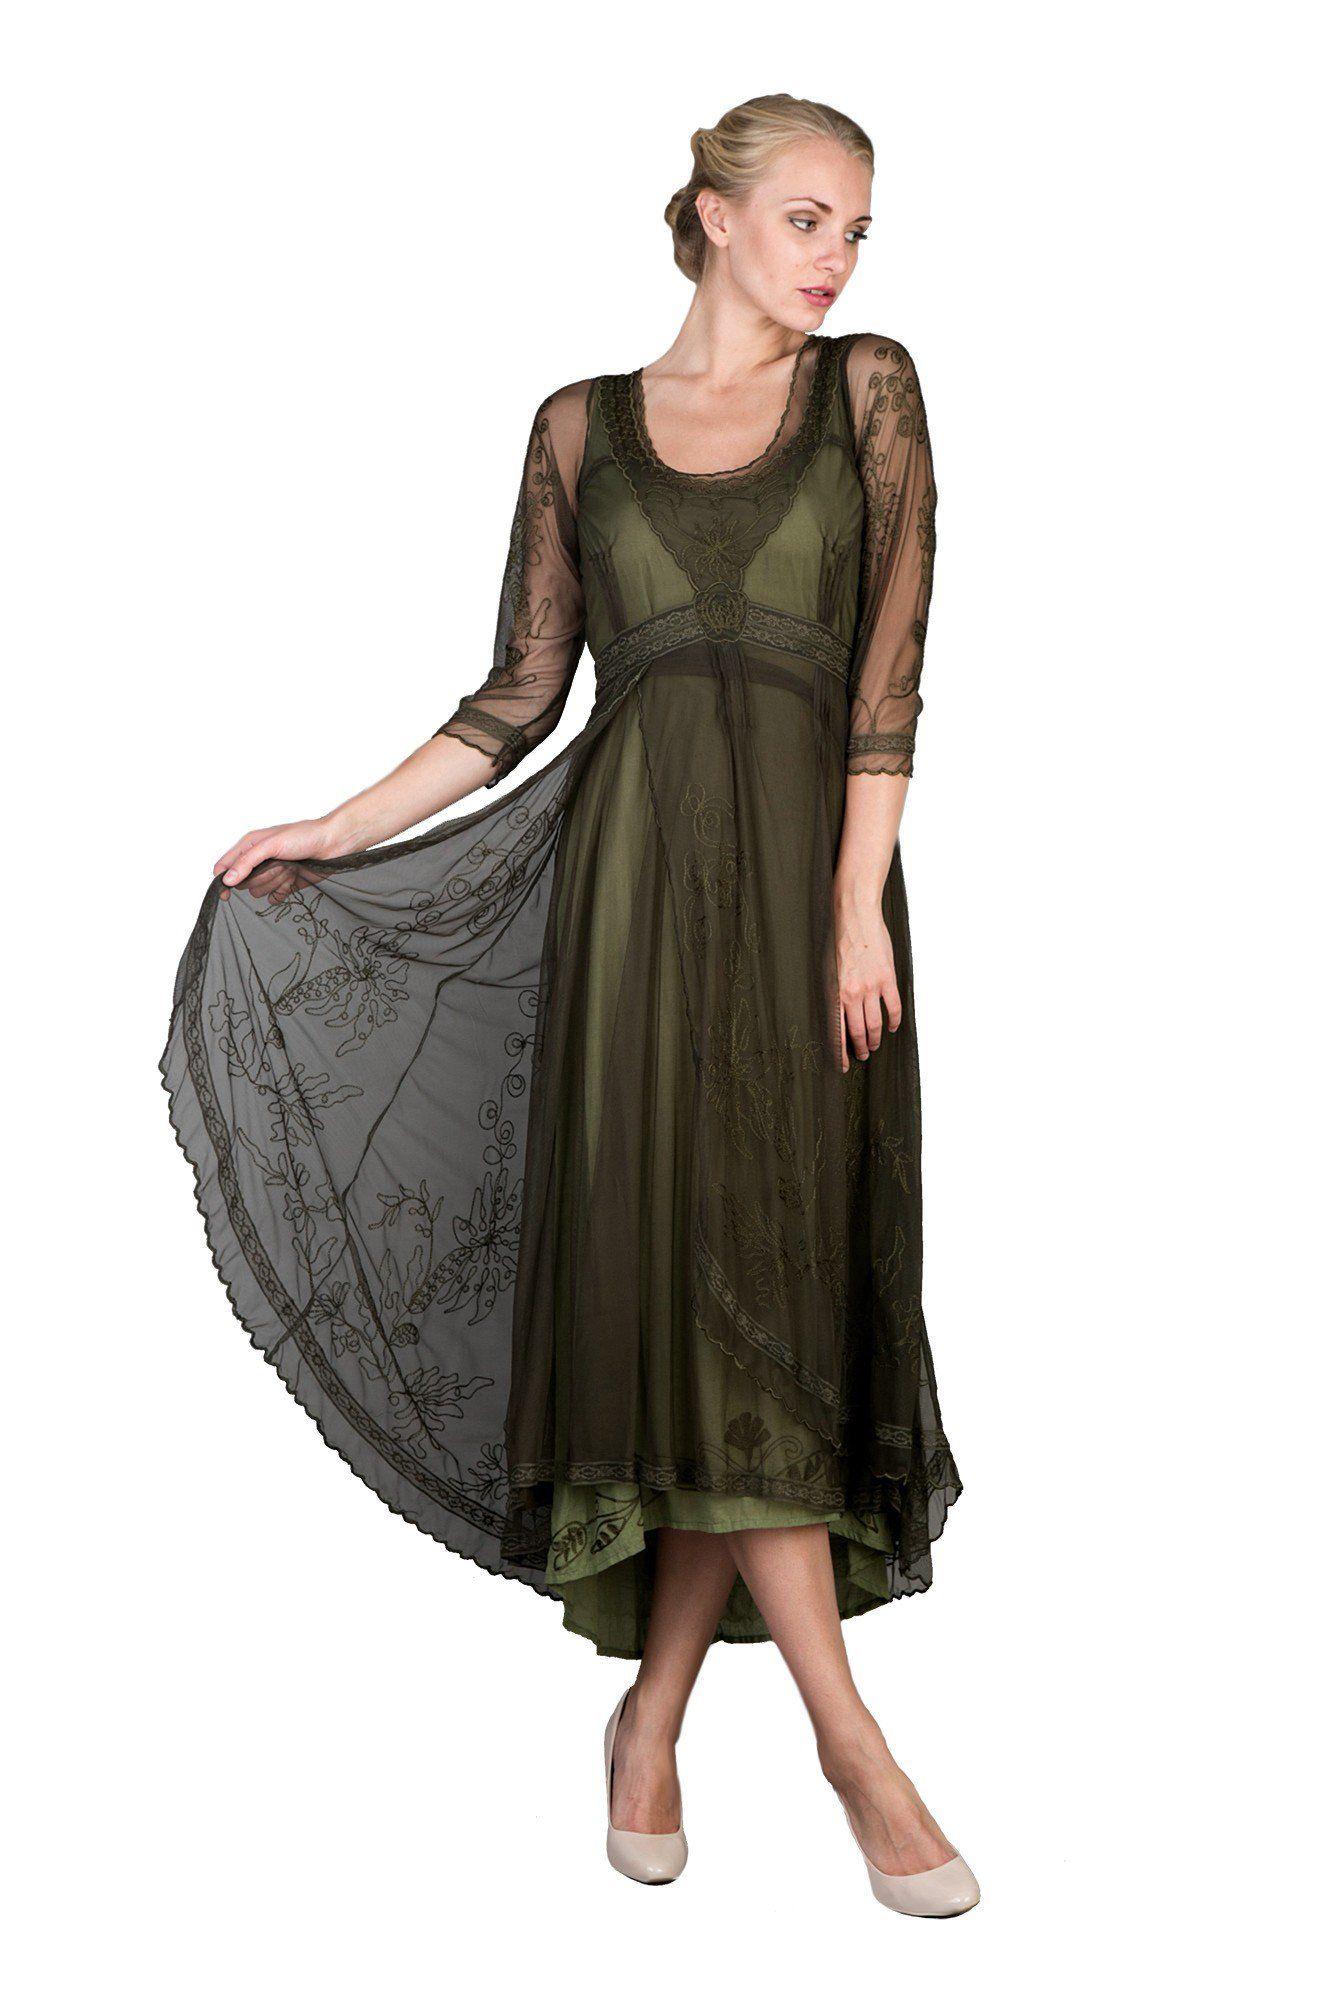 Emerald wedding dress  Downton Abbey Tea Party Gown in Emerald by Nataya  Vintage portrait